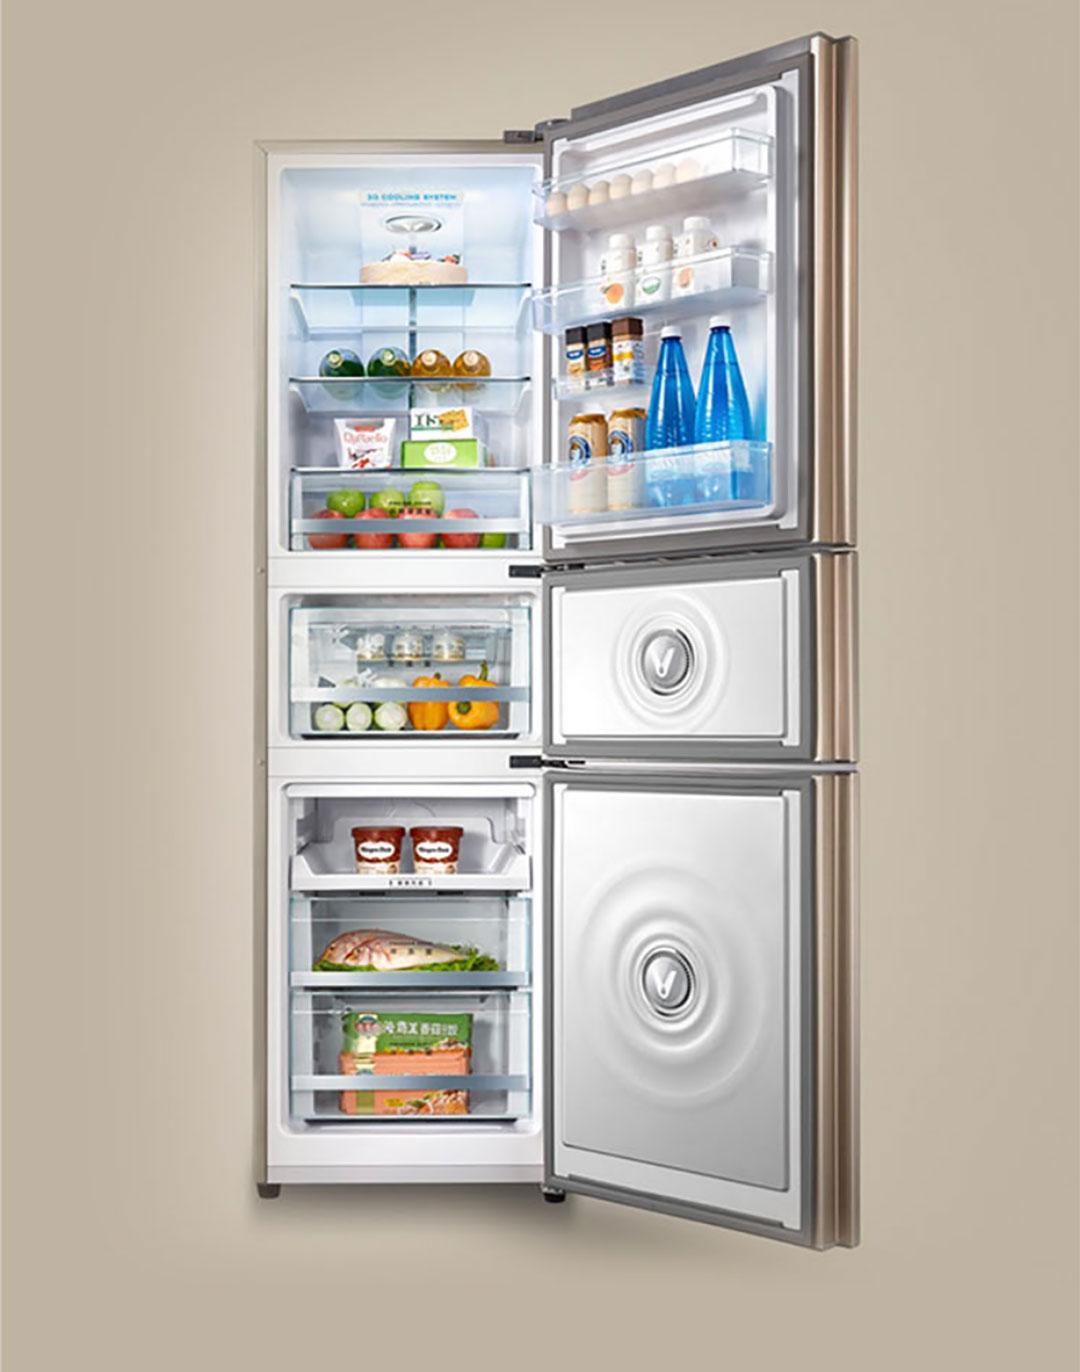 Xiaomi Viomi Refrigerator Sterilisation Filter